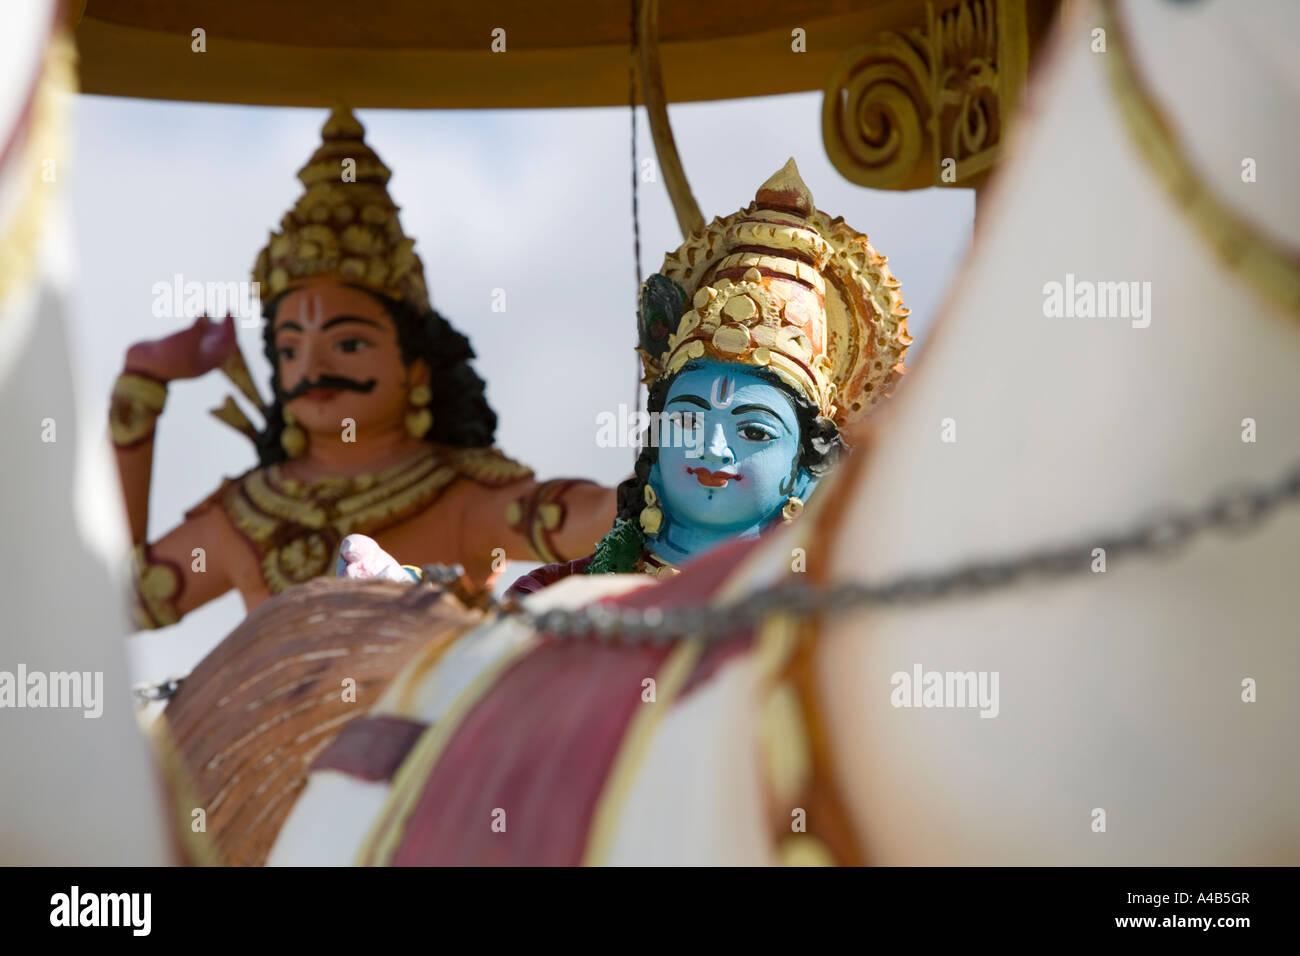 [^Hari ^Hara ^Tamil ^Temple] with ^Krishna and ^Karnam in ^chariot - 'Mauritius' - Stock Image